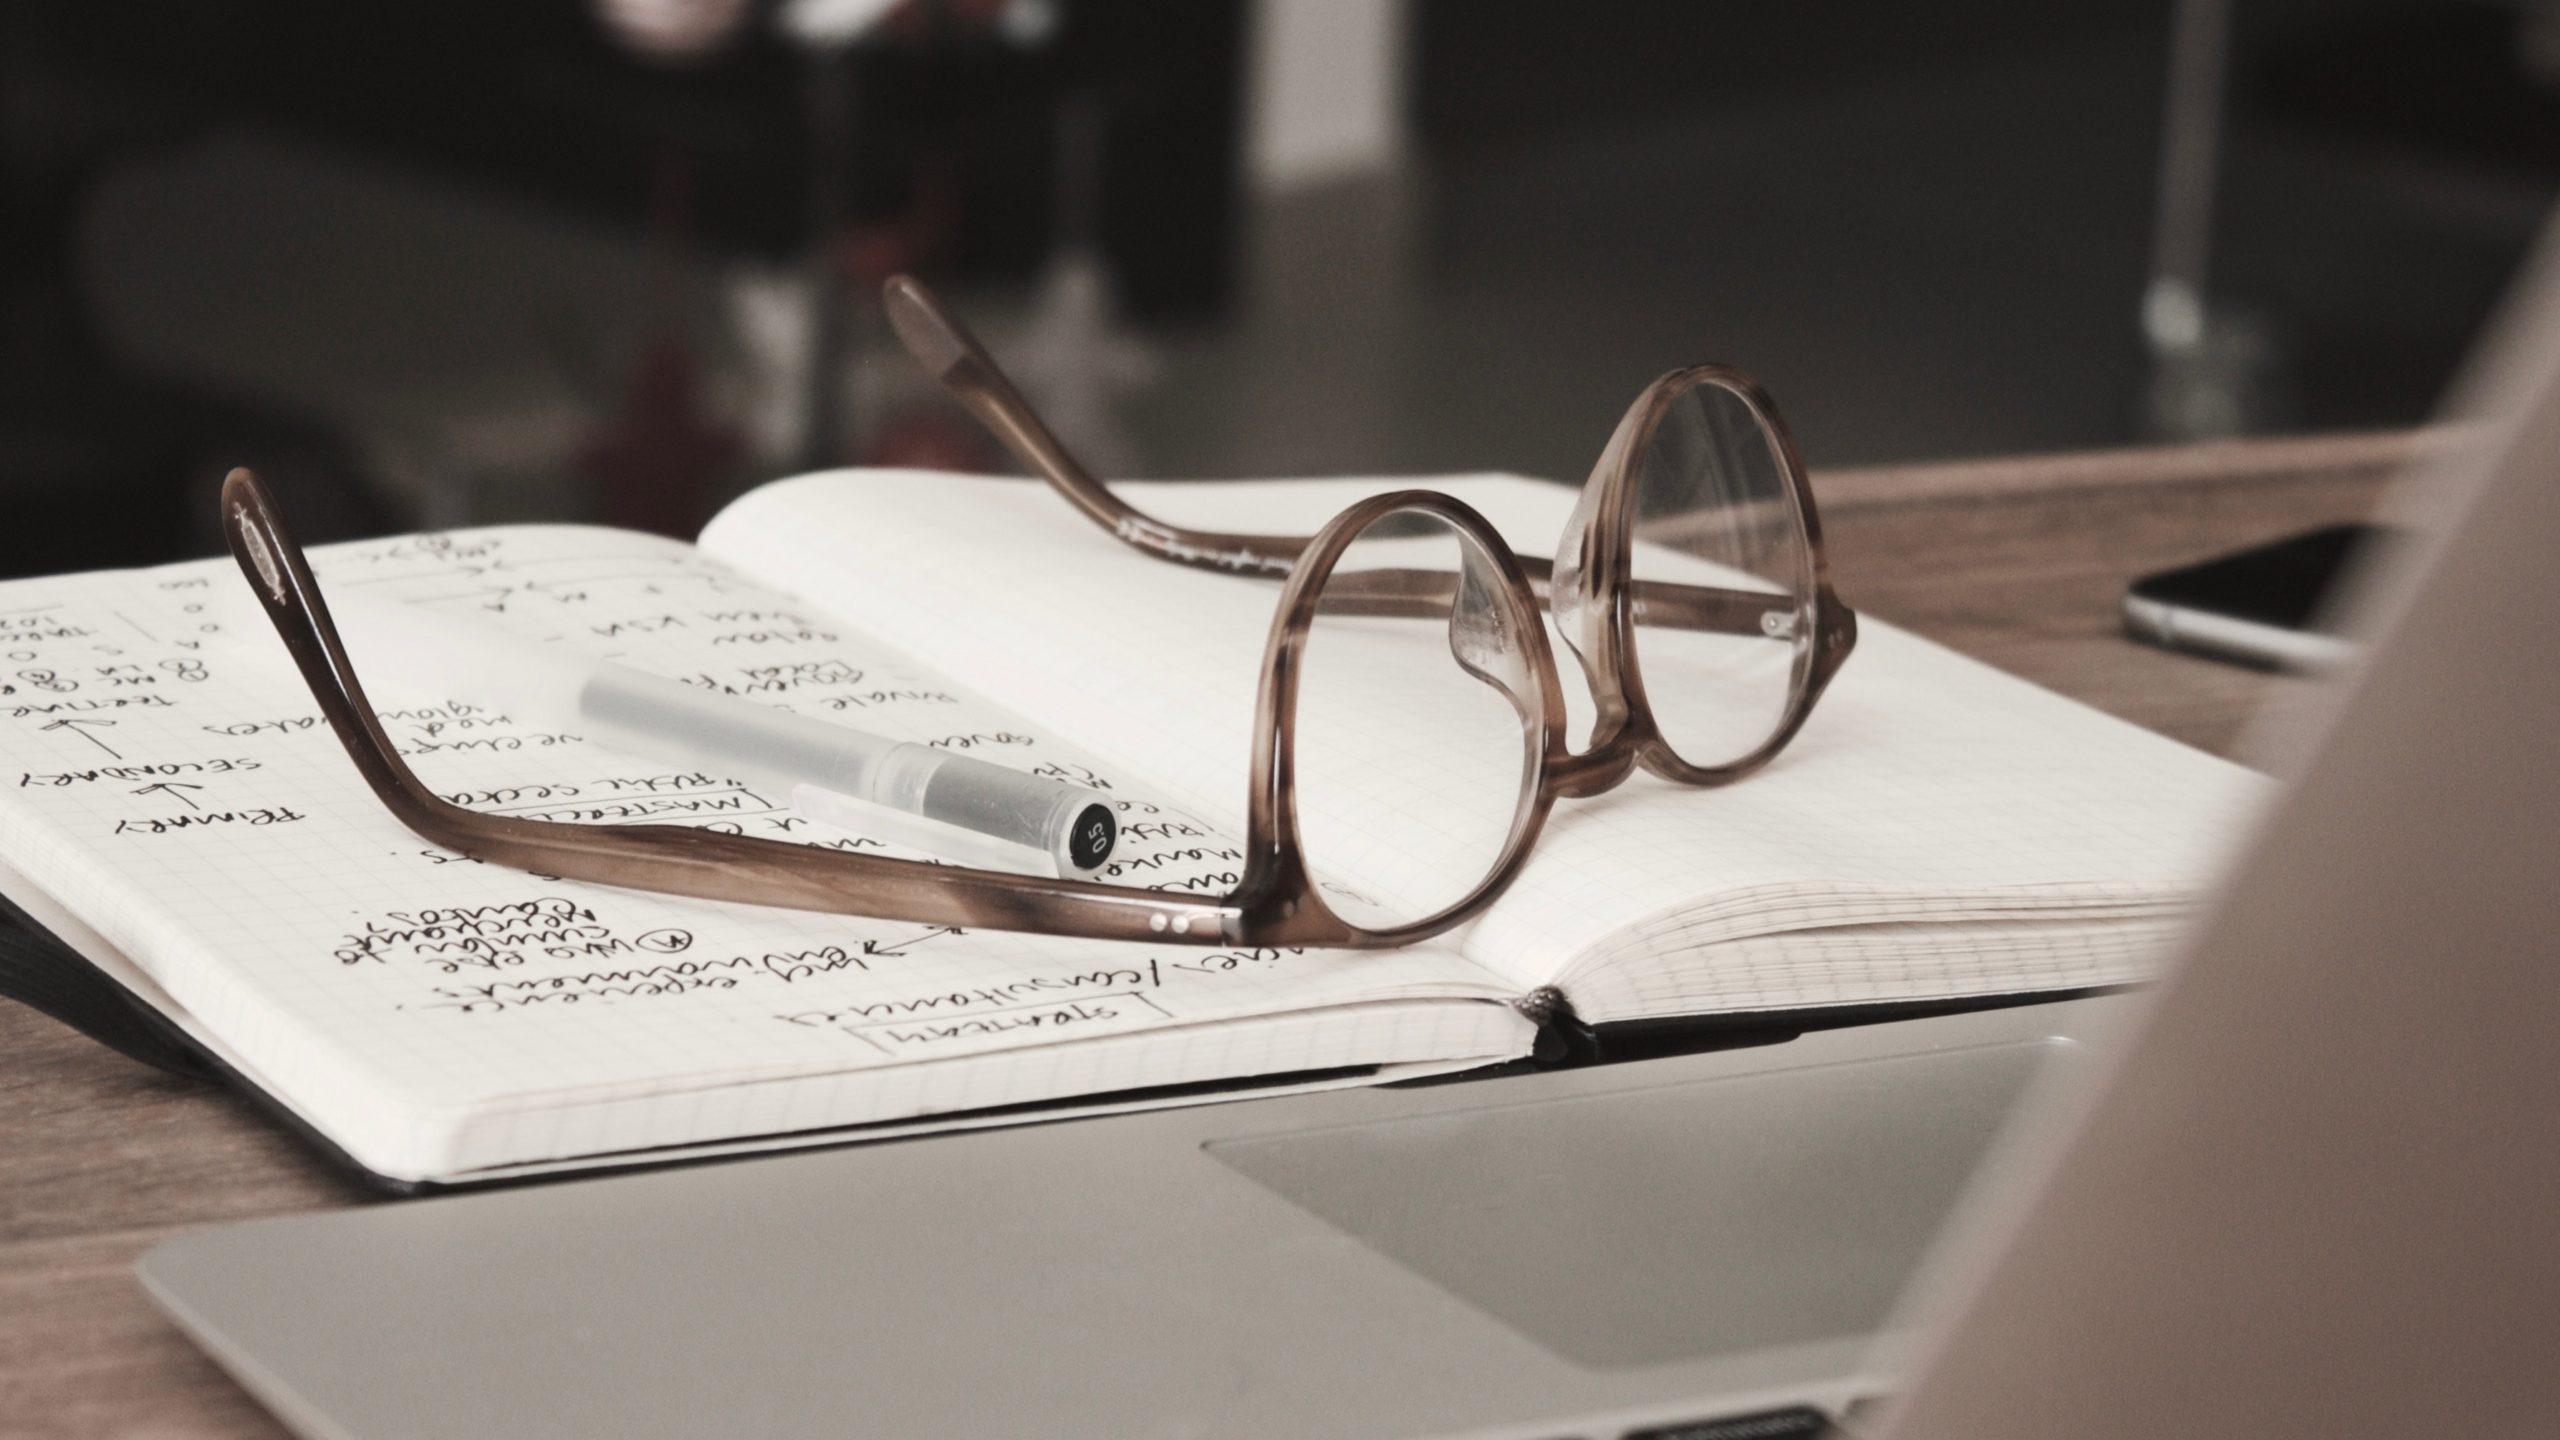 When Should You Hire a Copywriter?